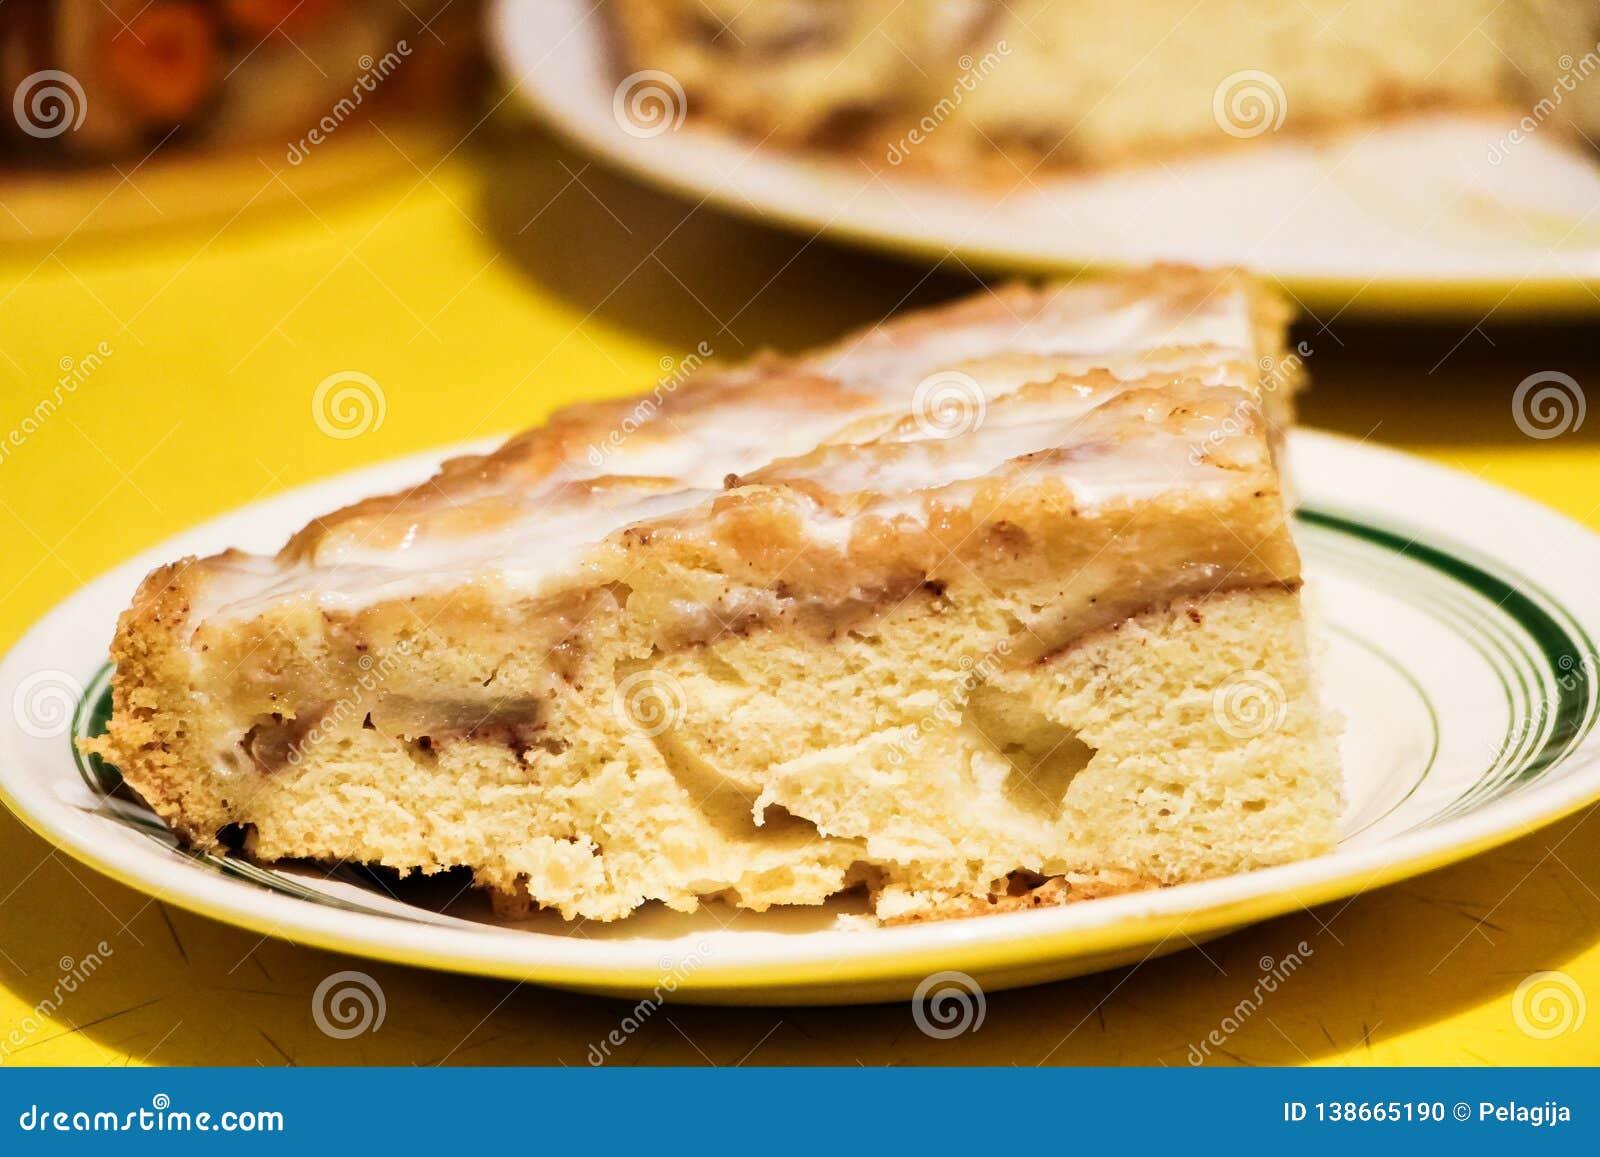 Empanada de Apple con crema amarga